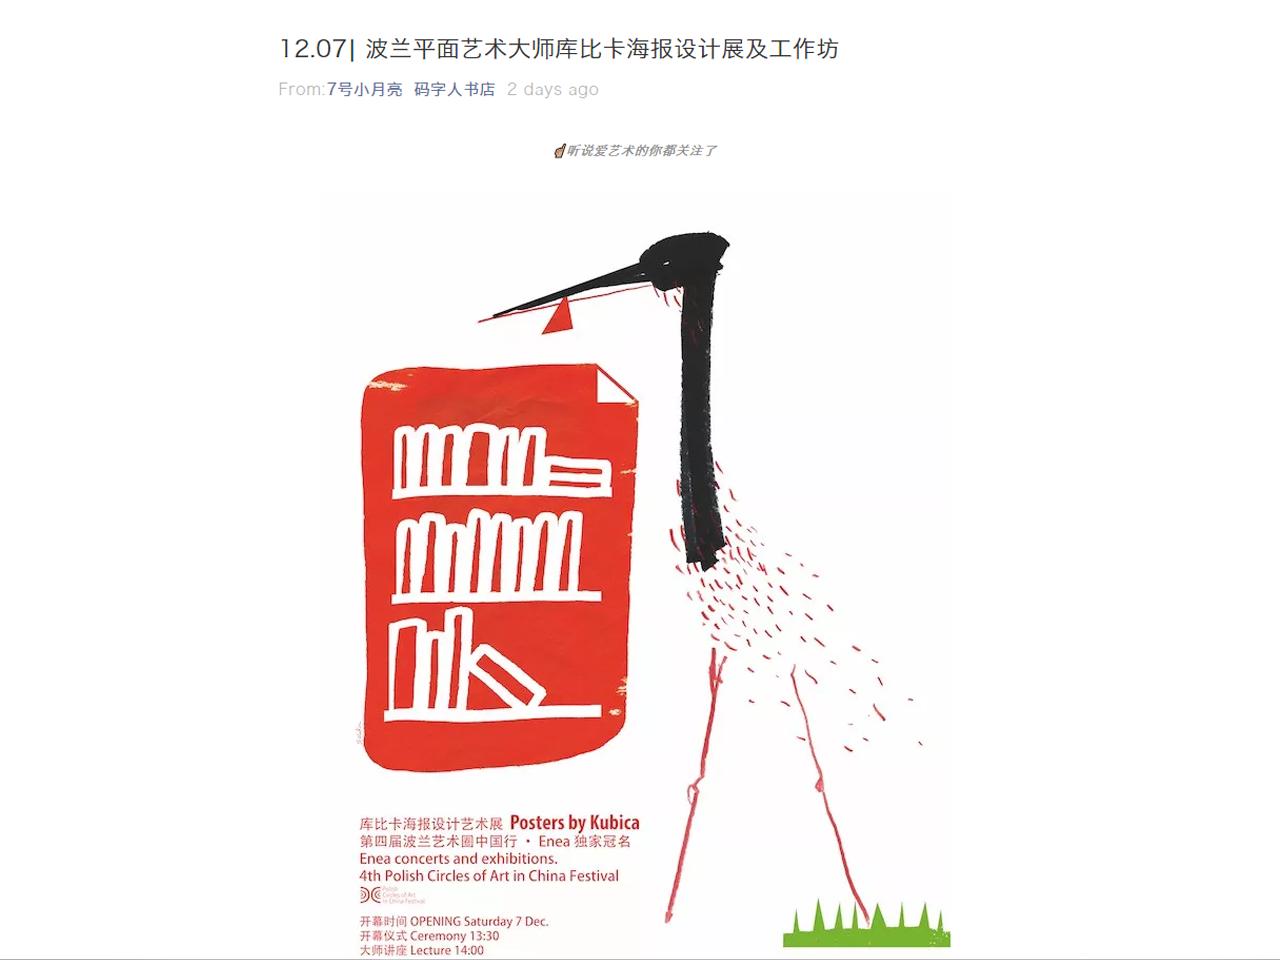 20191203_mp.weixin.qq.com